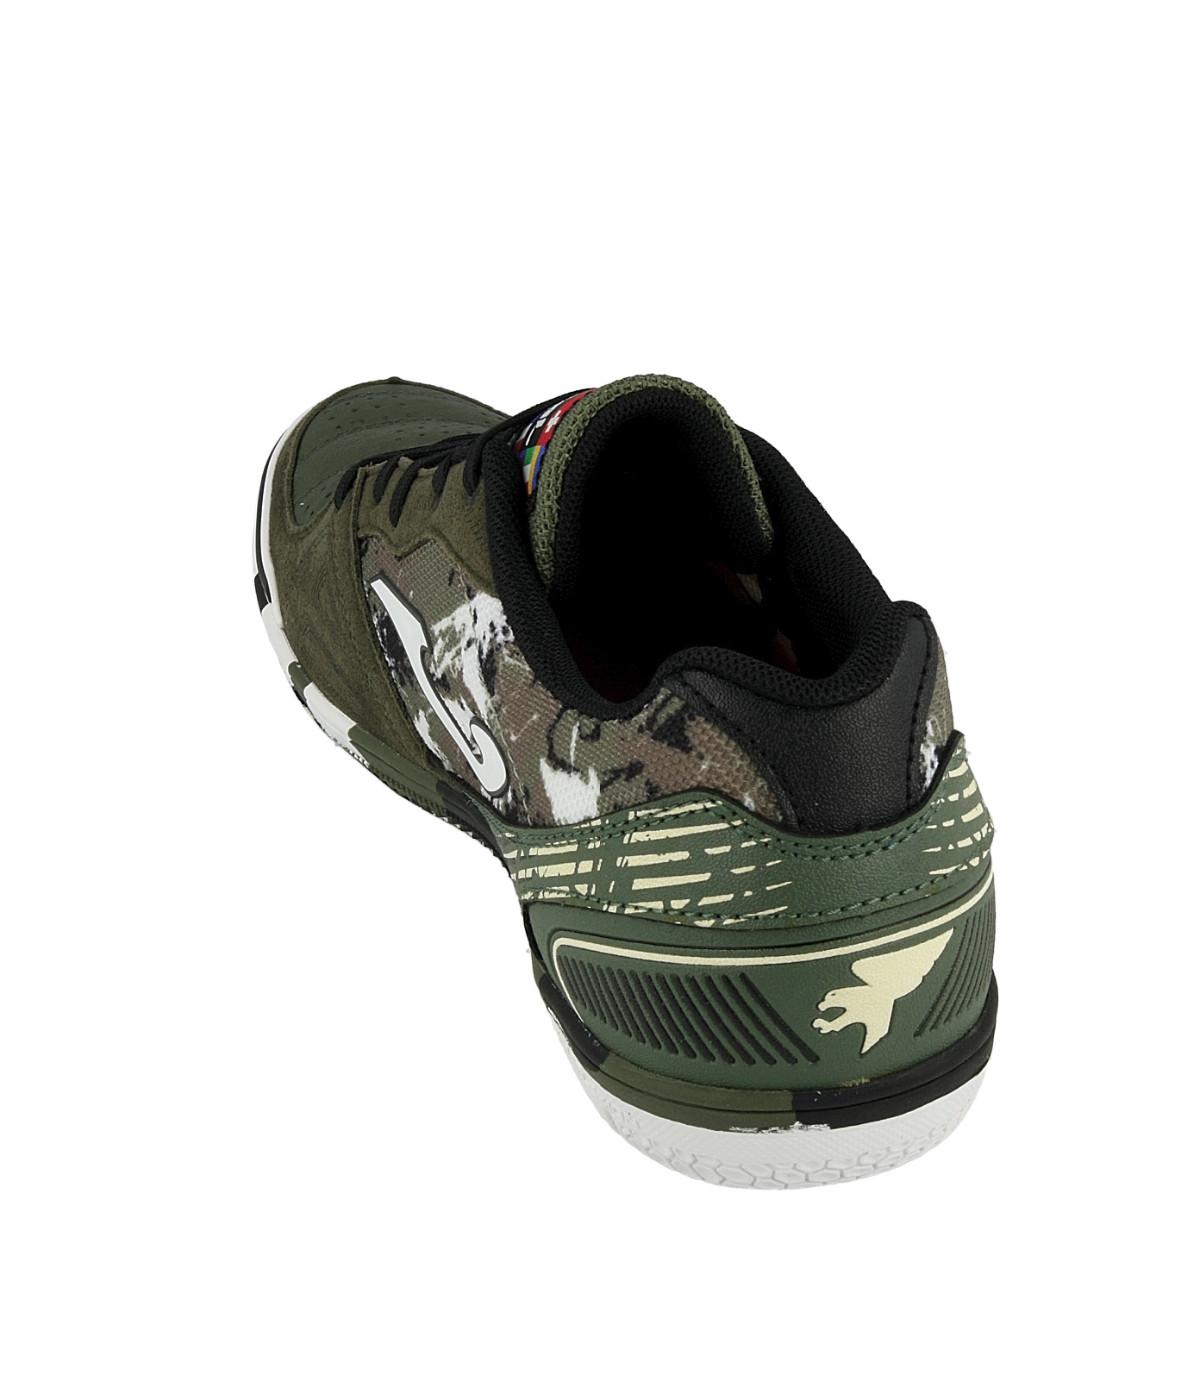 Football-shoes-Joma-Scarpe-Calcio-Mundial-Verde-Indoor-IC-Sala-Futsal-parquet miniatura 7